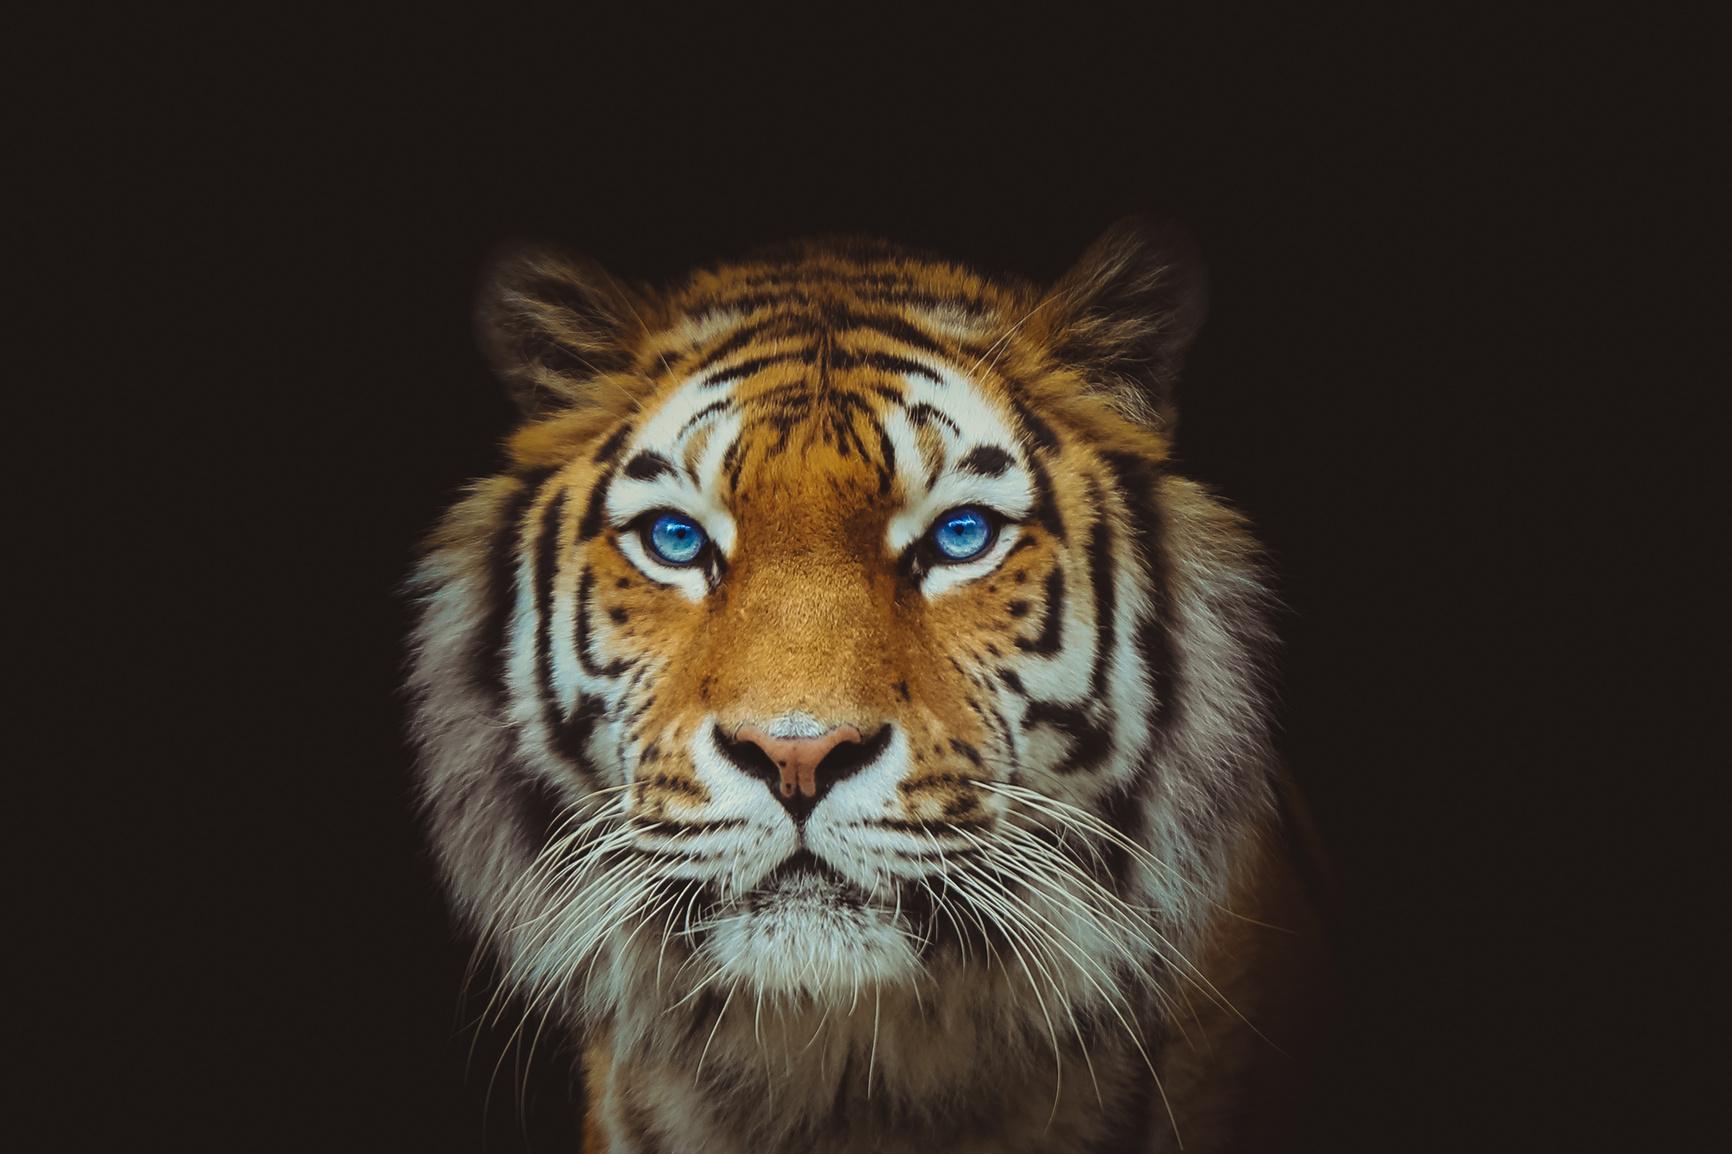 Eye of the Tiger, Getty